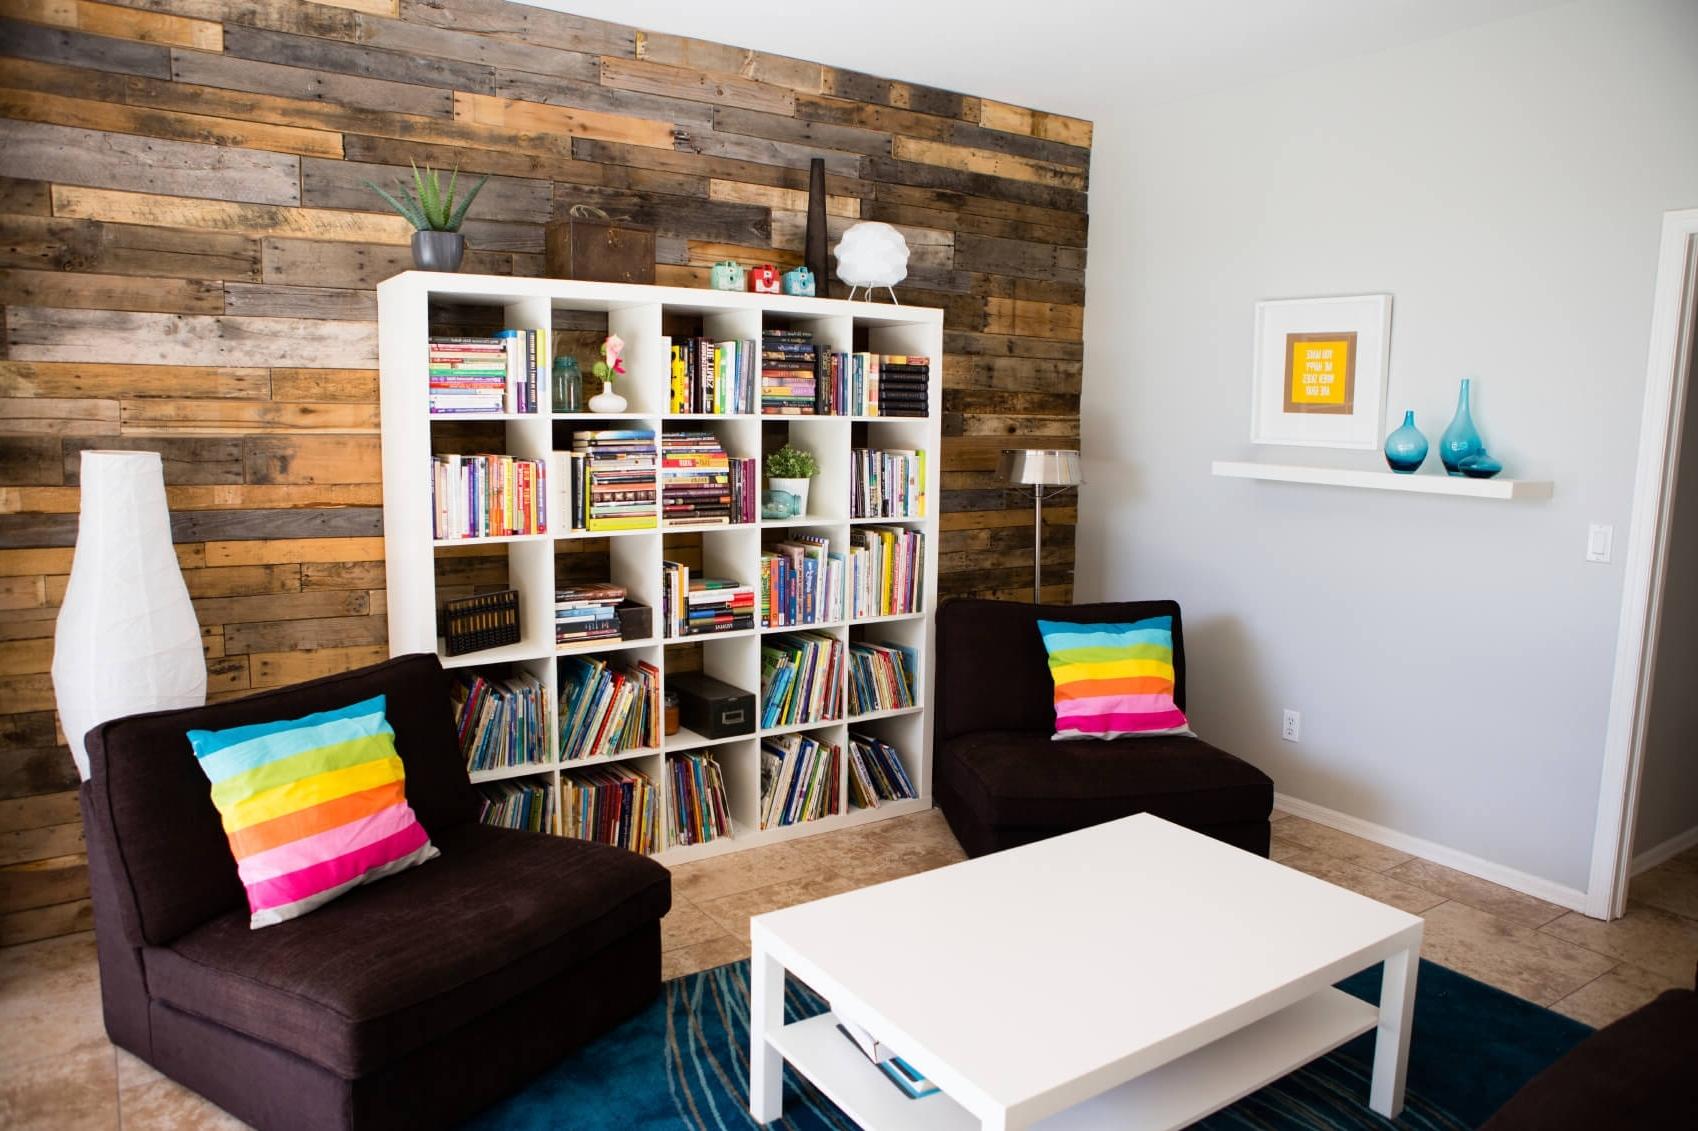 Whole Wall Bookshelves Regarding Famous Bookshelf For Wall Wall To Wall Bookcase Units Whole Wall (View 13 of 15)